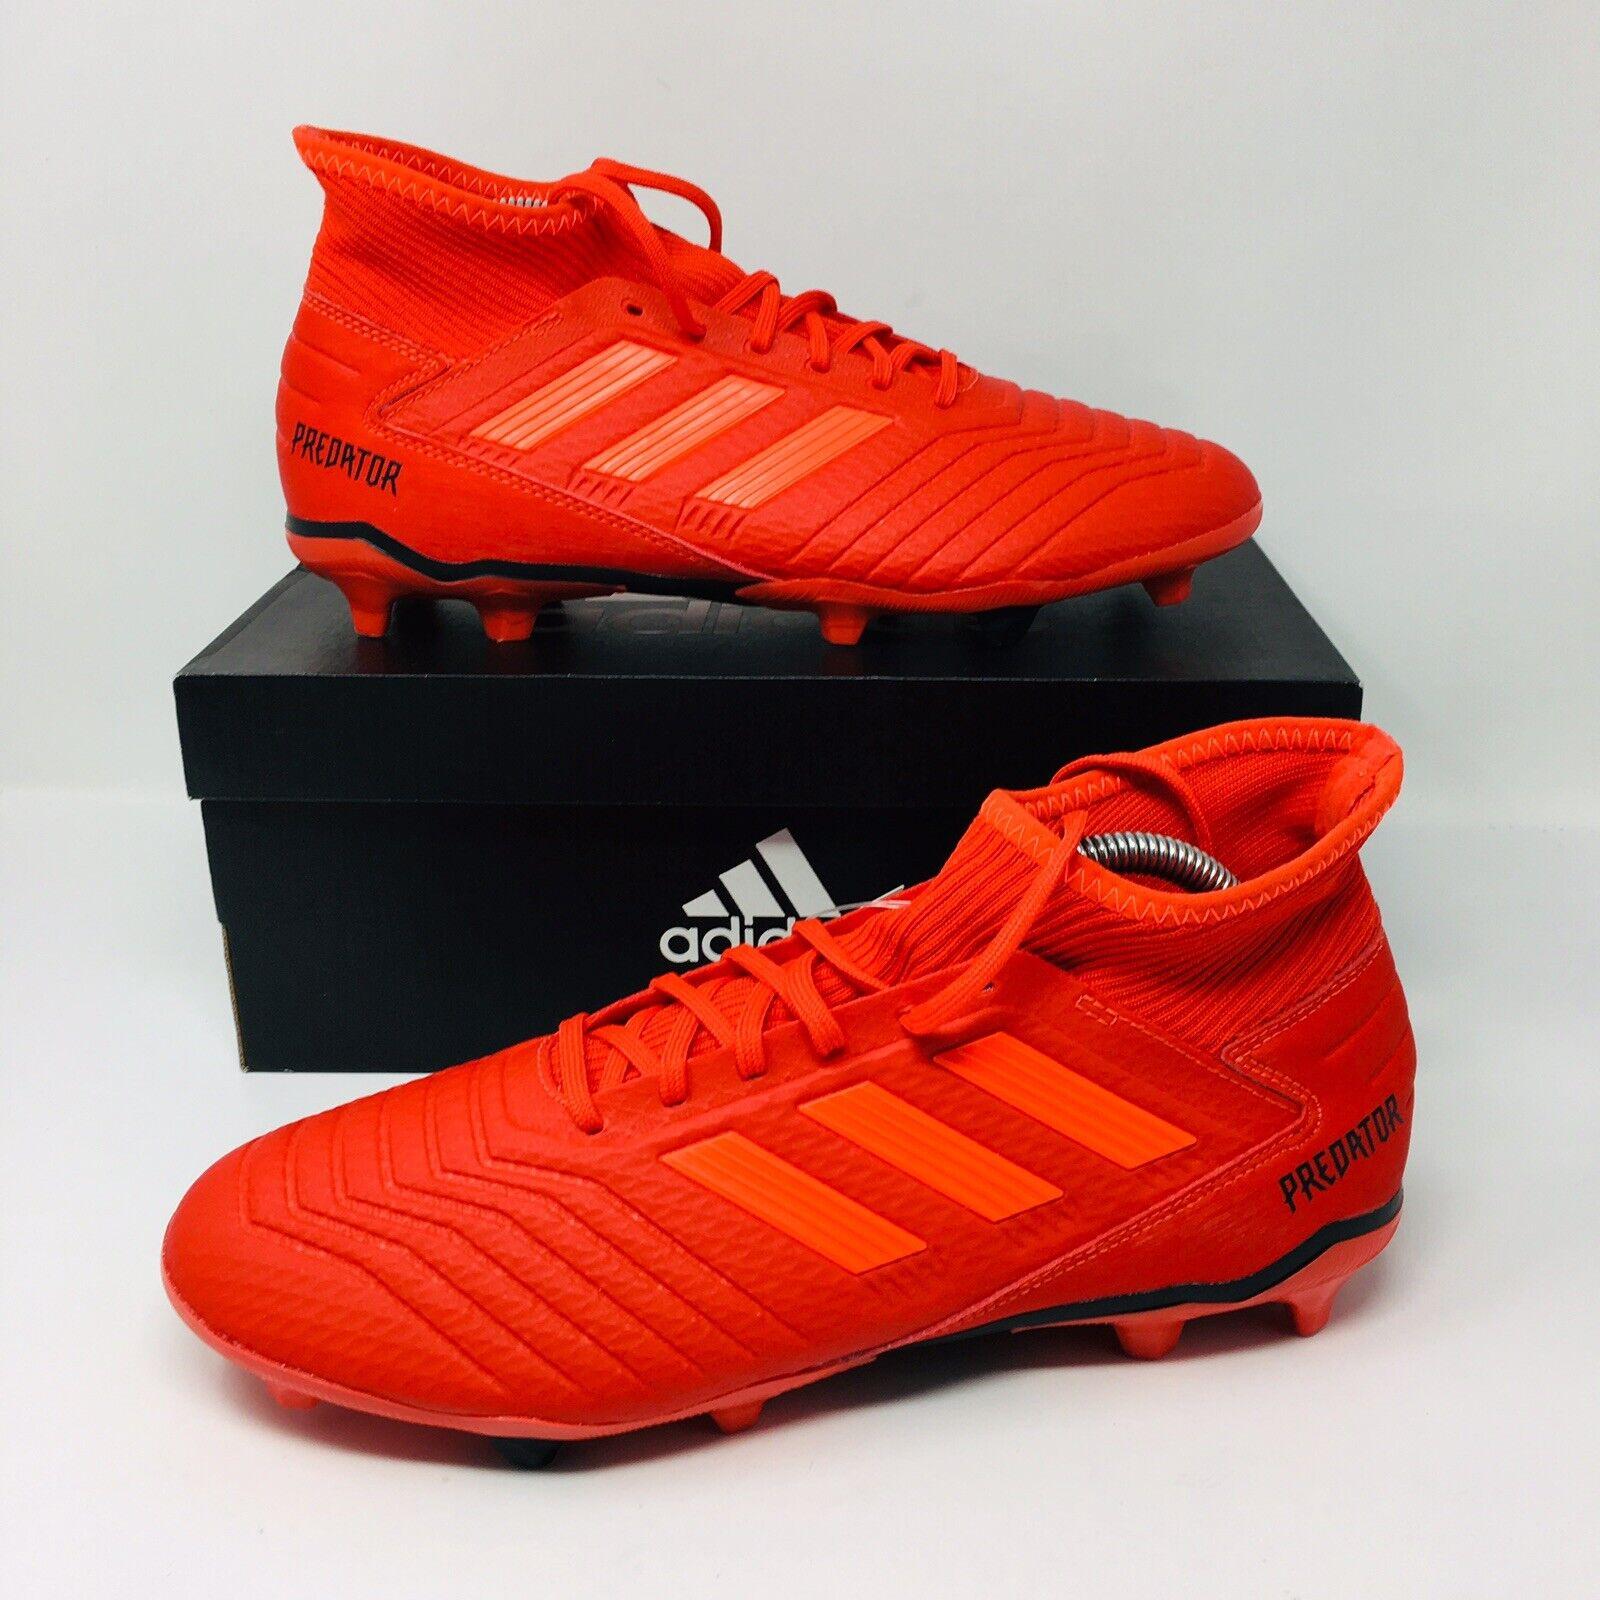 NEW Adidas Predator 19.3 FG (Men Size 10.5) Red Futbol Soccer Cleats Pogba.